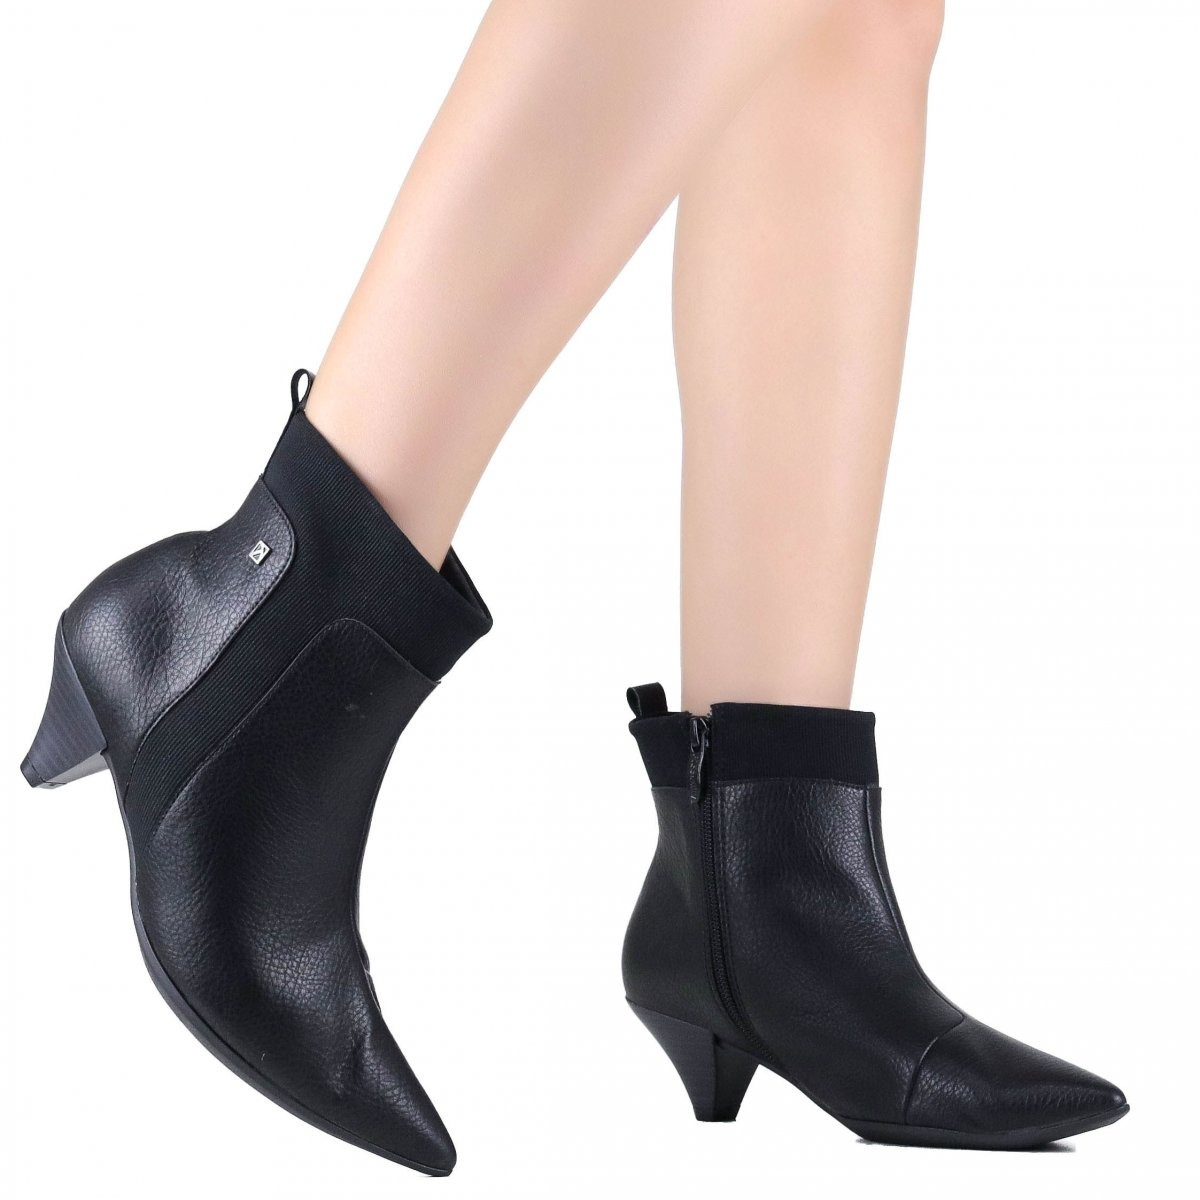 ab56442e40 Bota Feminina Ankle Boot Piccadilly Bico Fino Preto 119015 - R  304 ...